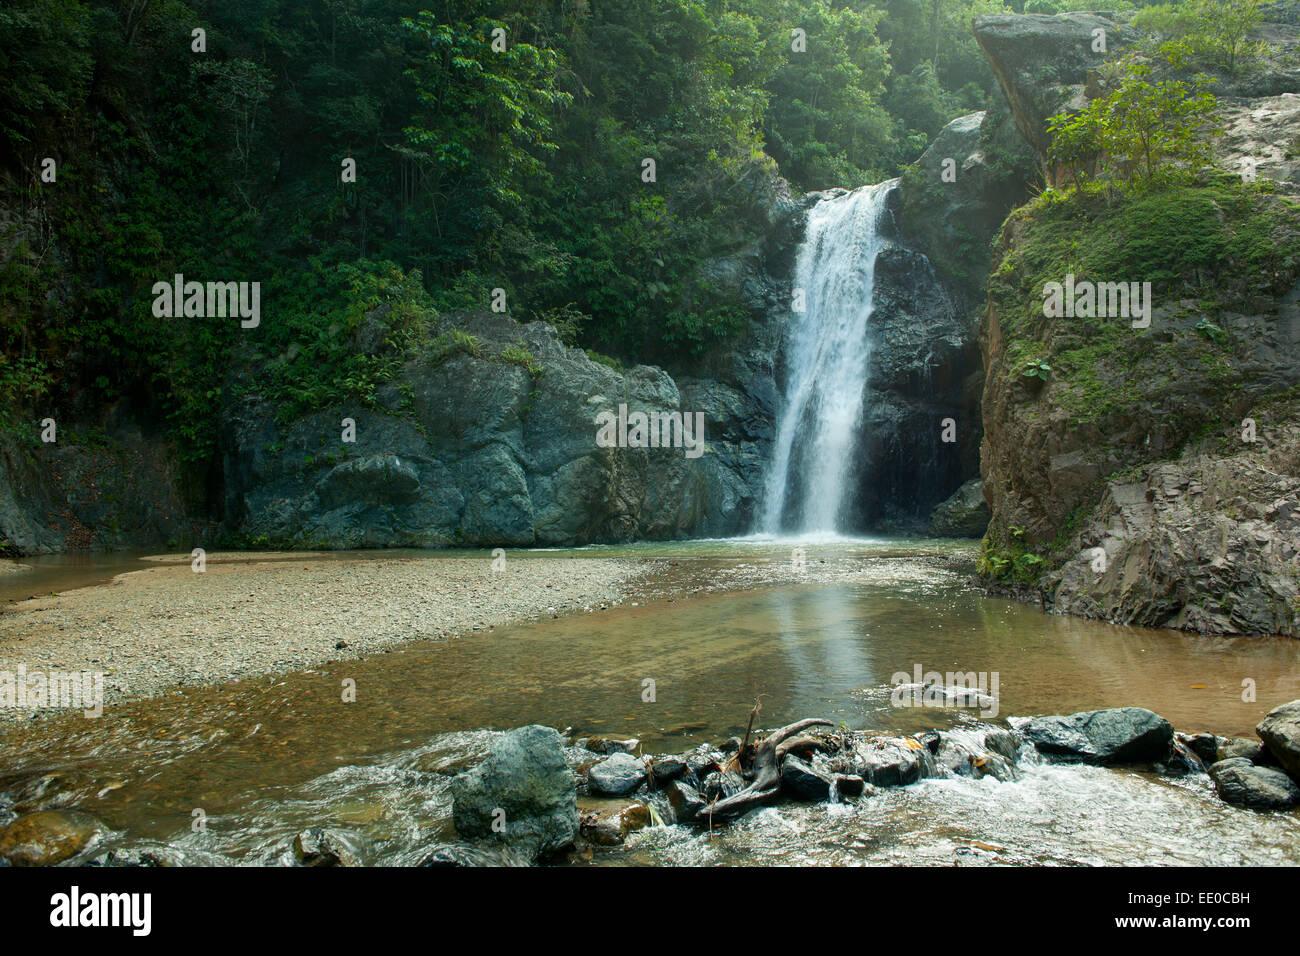 Dominikanische Republik, Cordillera Central, Jarabacoa, Wasserfall Salto Baiguate Immagini Stock